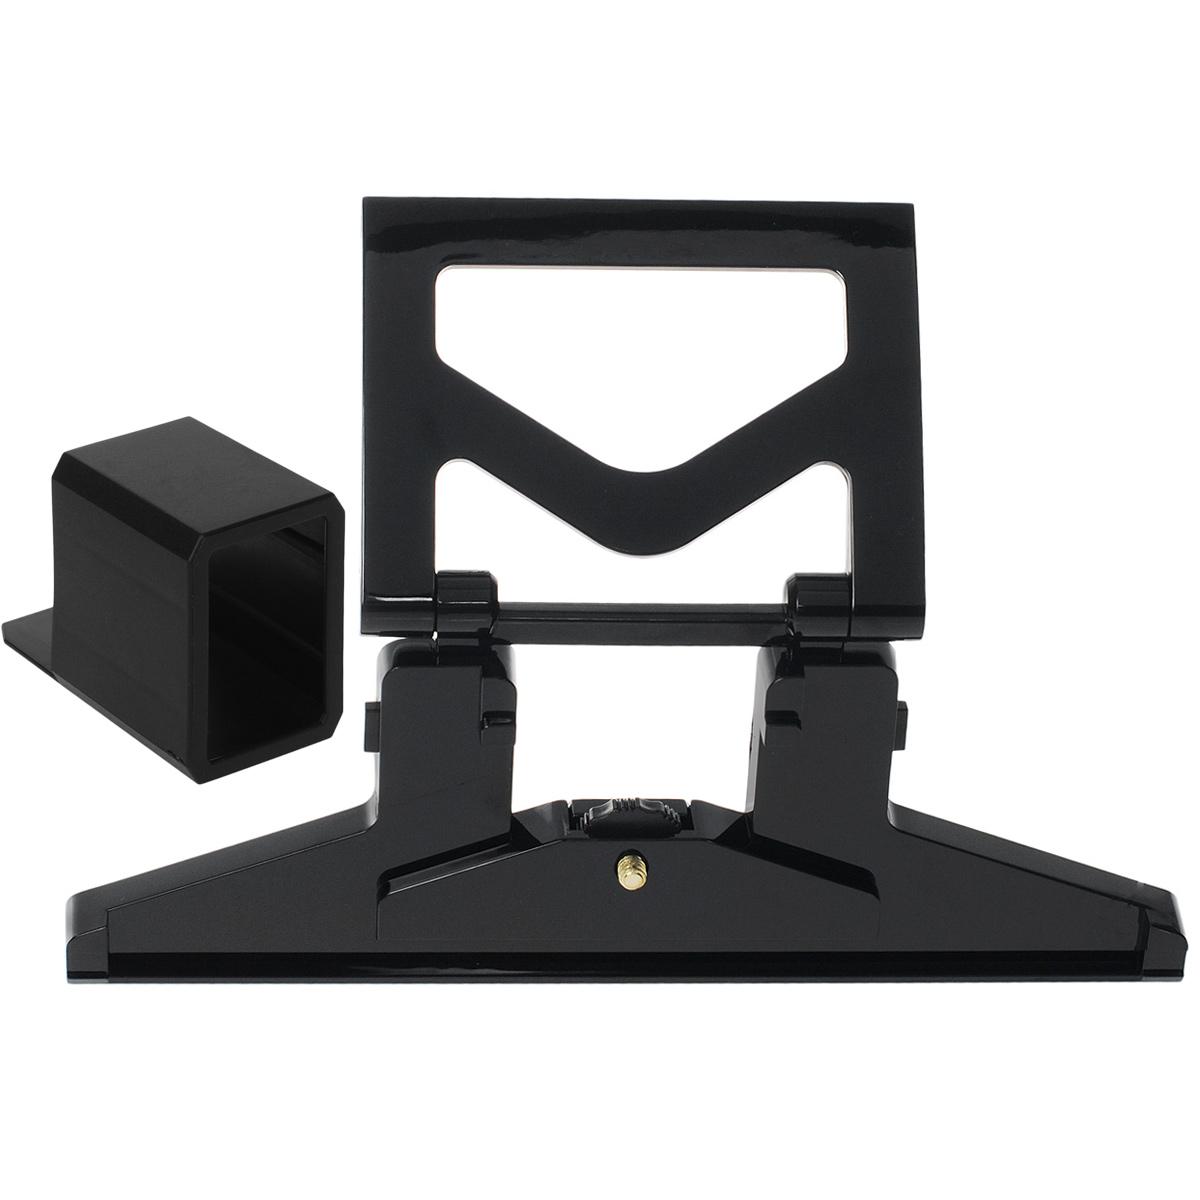 Крепление на телевизор Black Horns для Kinect Xbox OneBH-XB-03Крепление на телевизор Black Horns для Kinect Xbox One надежно удержит ваше устройство.